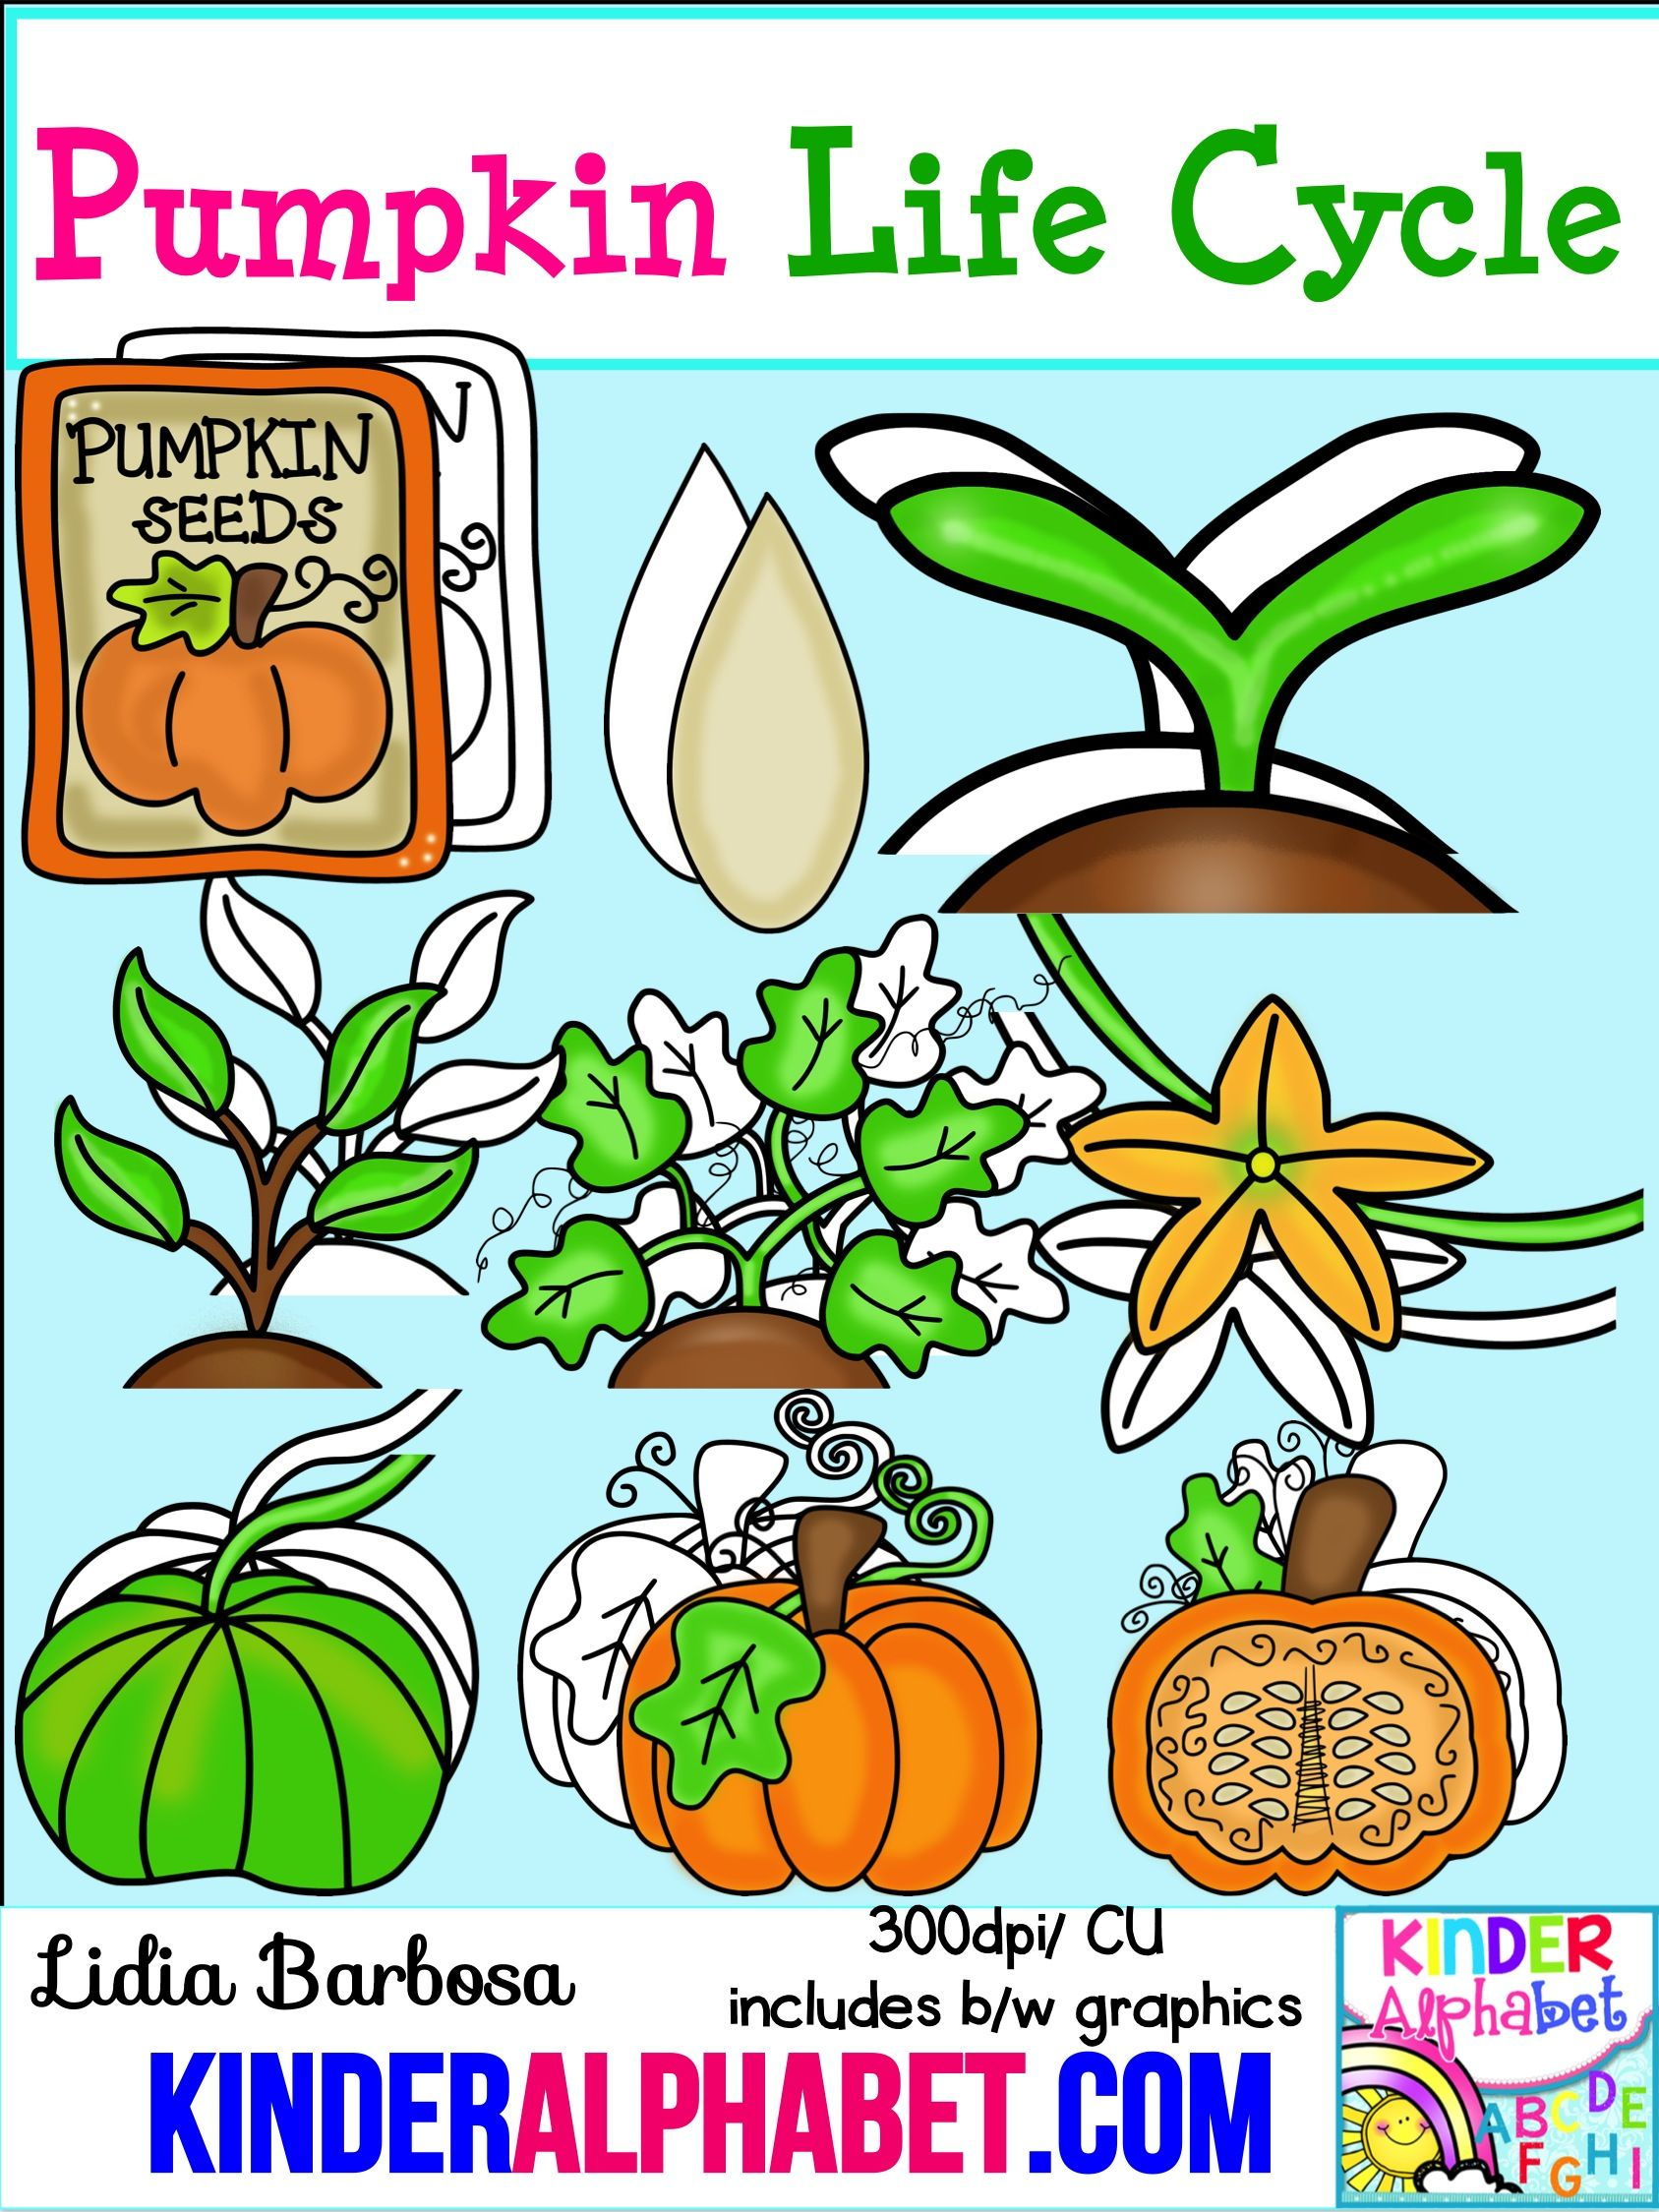 Pumpkin Life Cycle Clip Art For Teachers